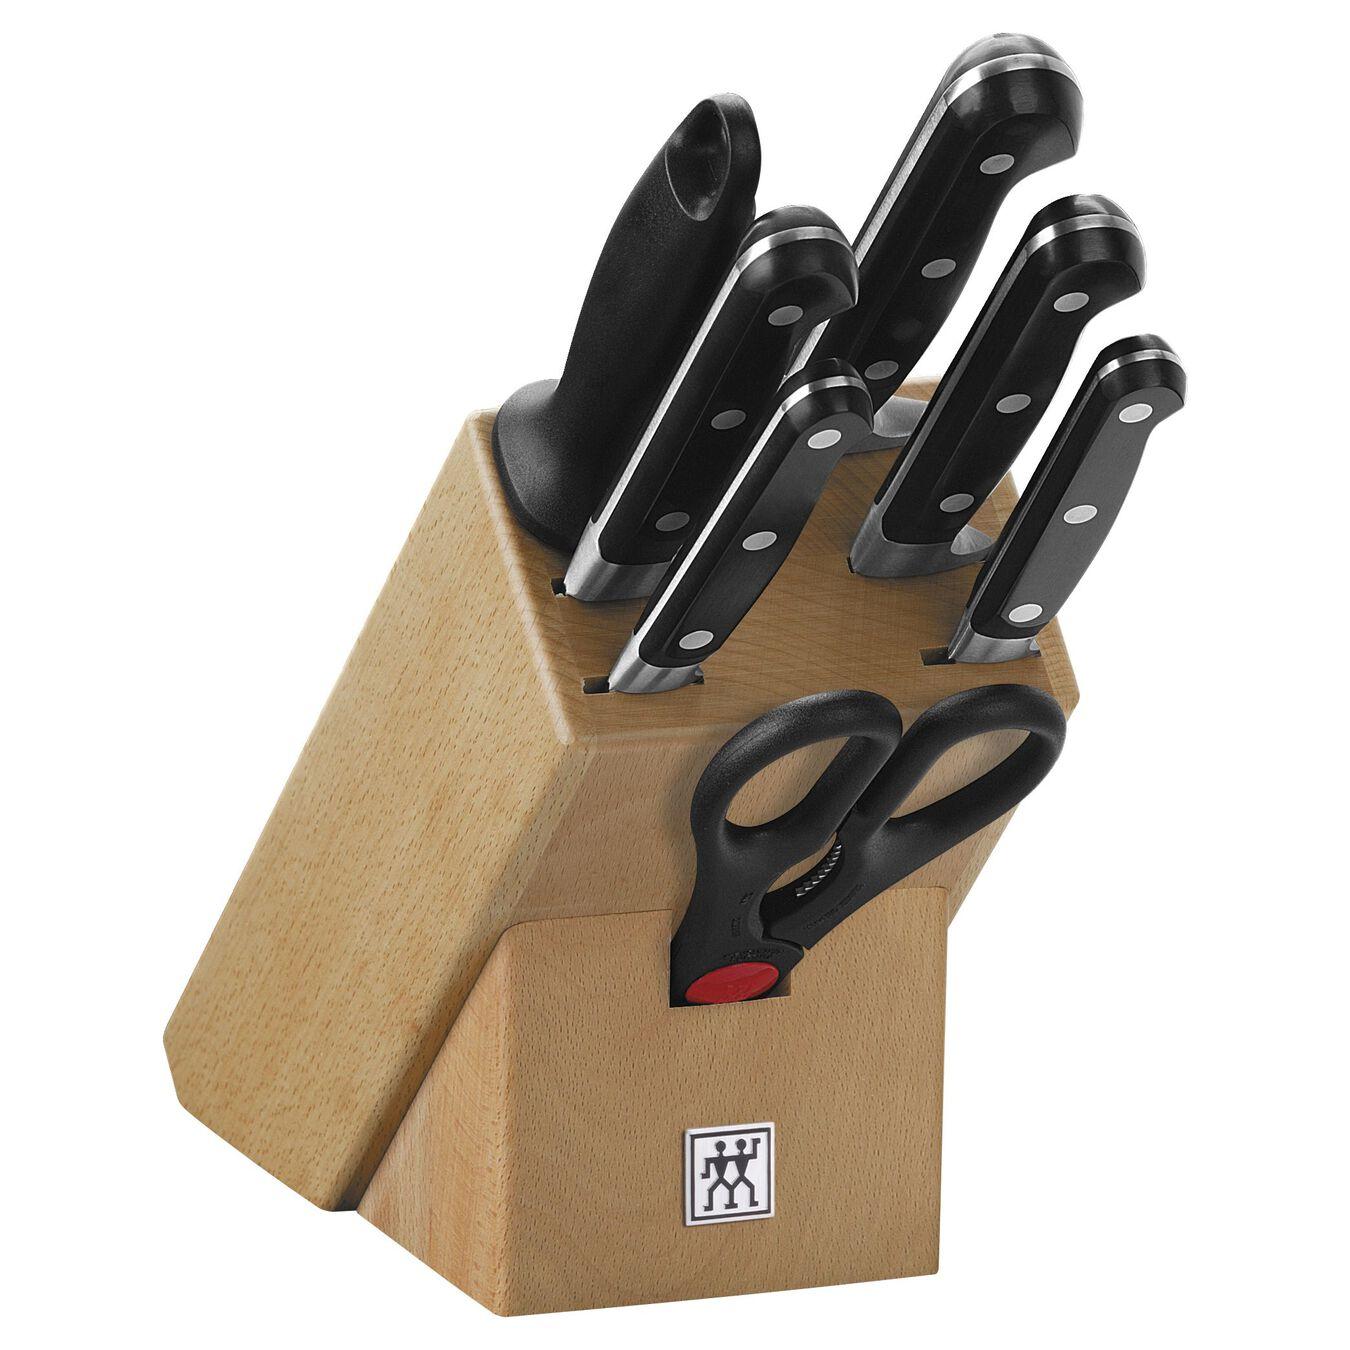 Blok Bıçak Seti | Özel Formül Çelik | 8-parça,,large 1